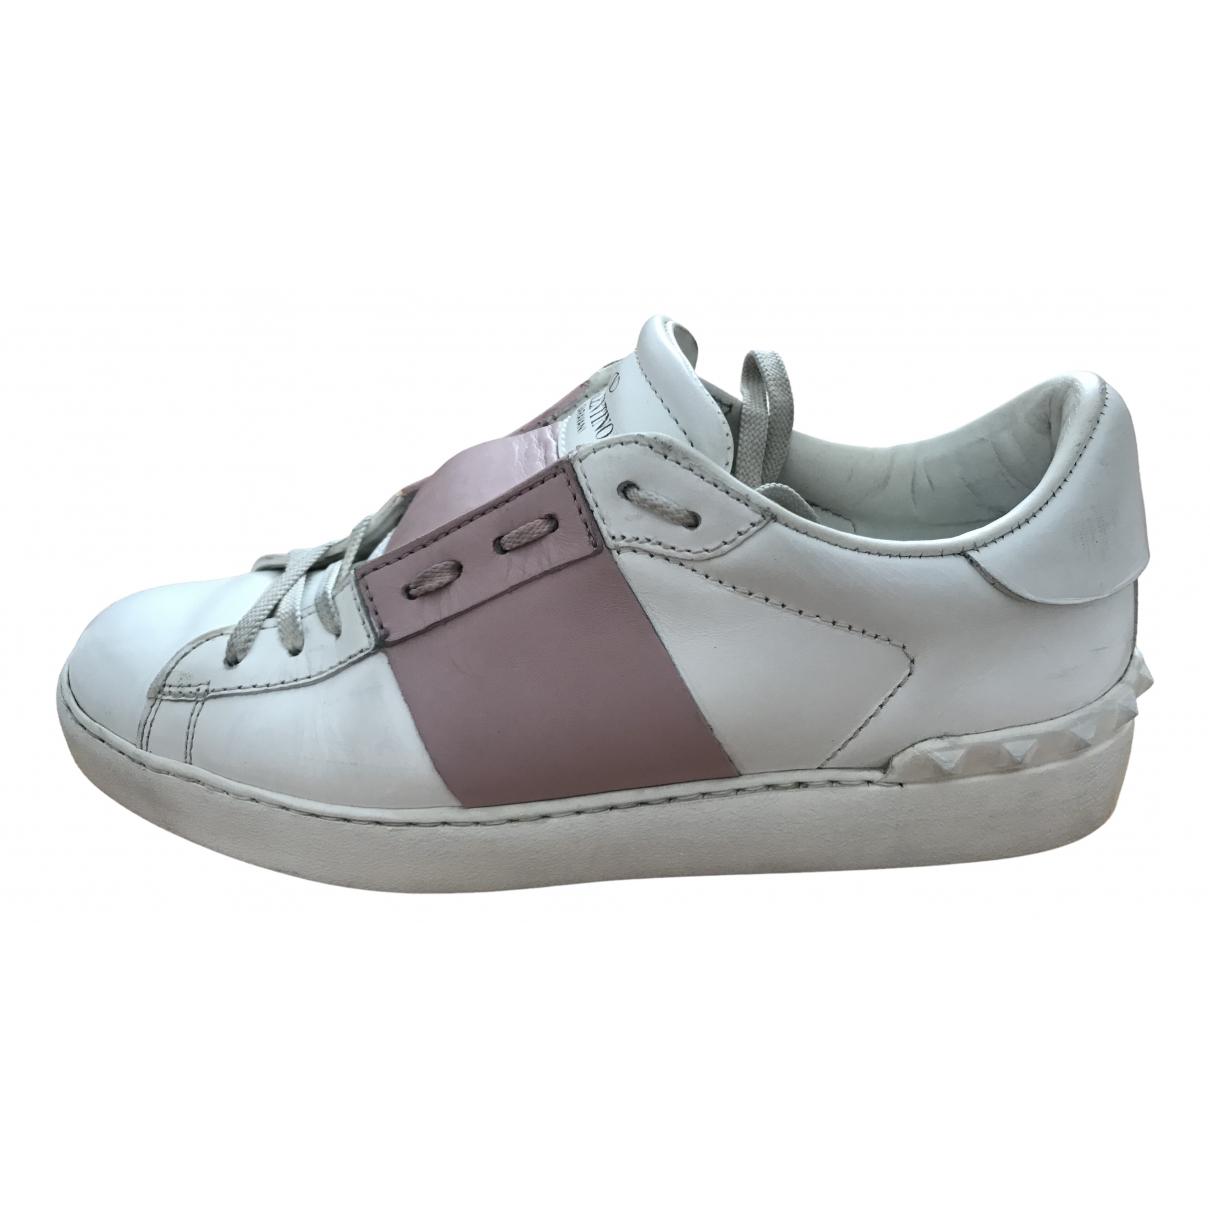 Valentino Garavani - Baskets Rockstud pour femme en cuir - blanc